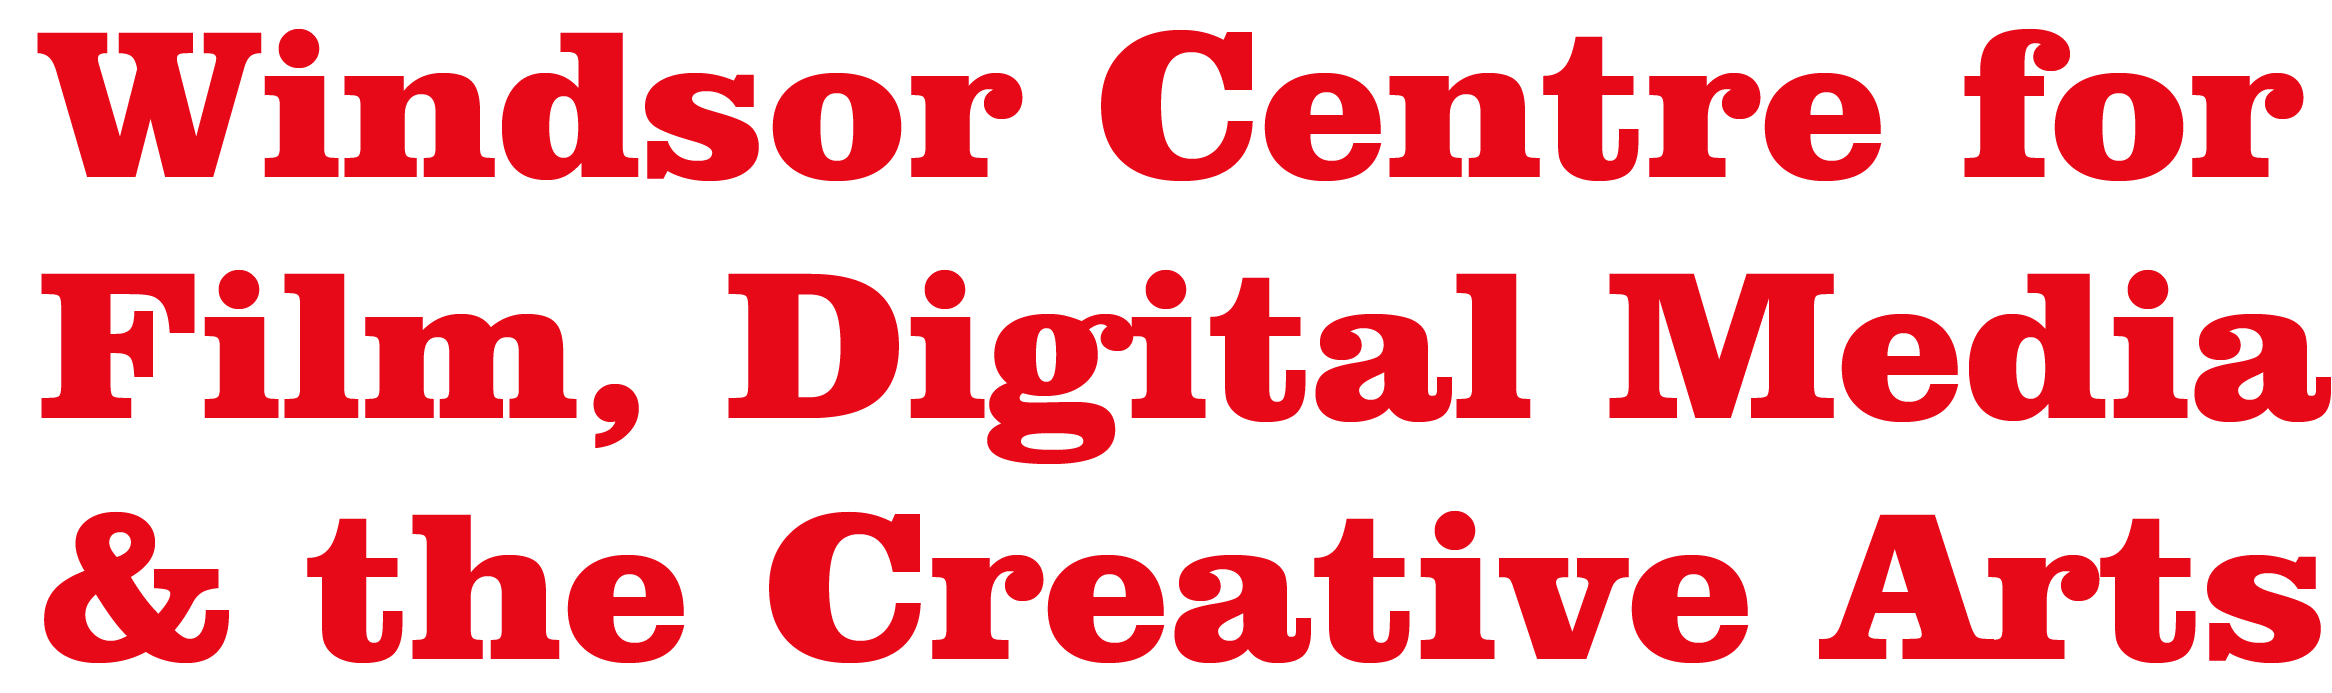 WindsorCentreforFilm Logo Red-2